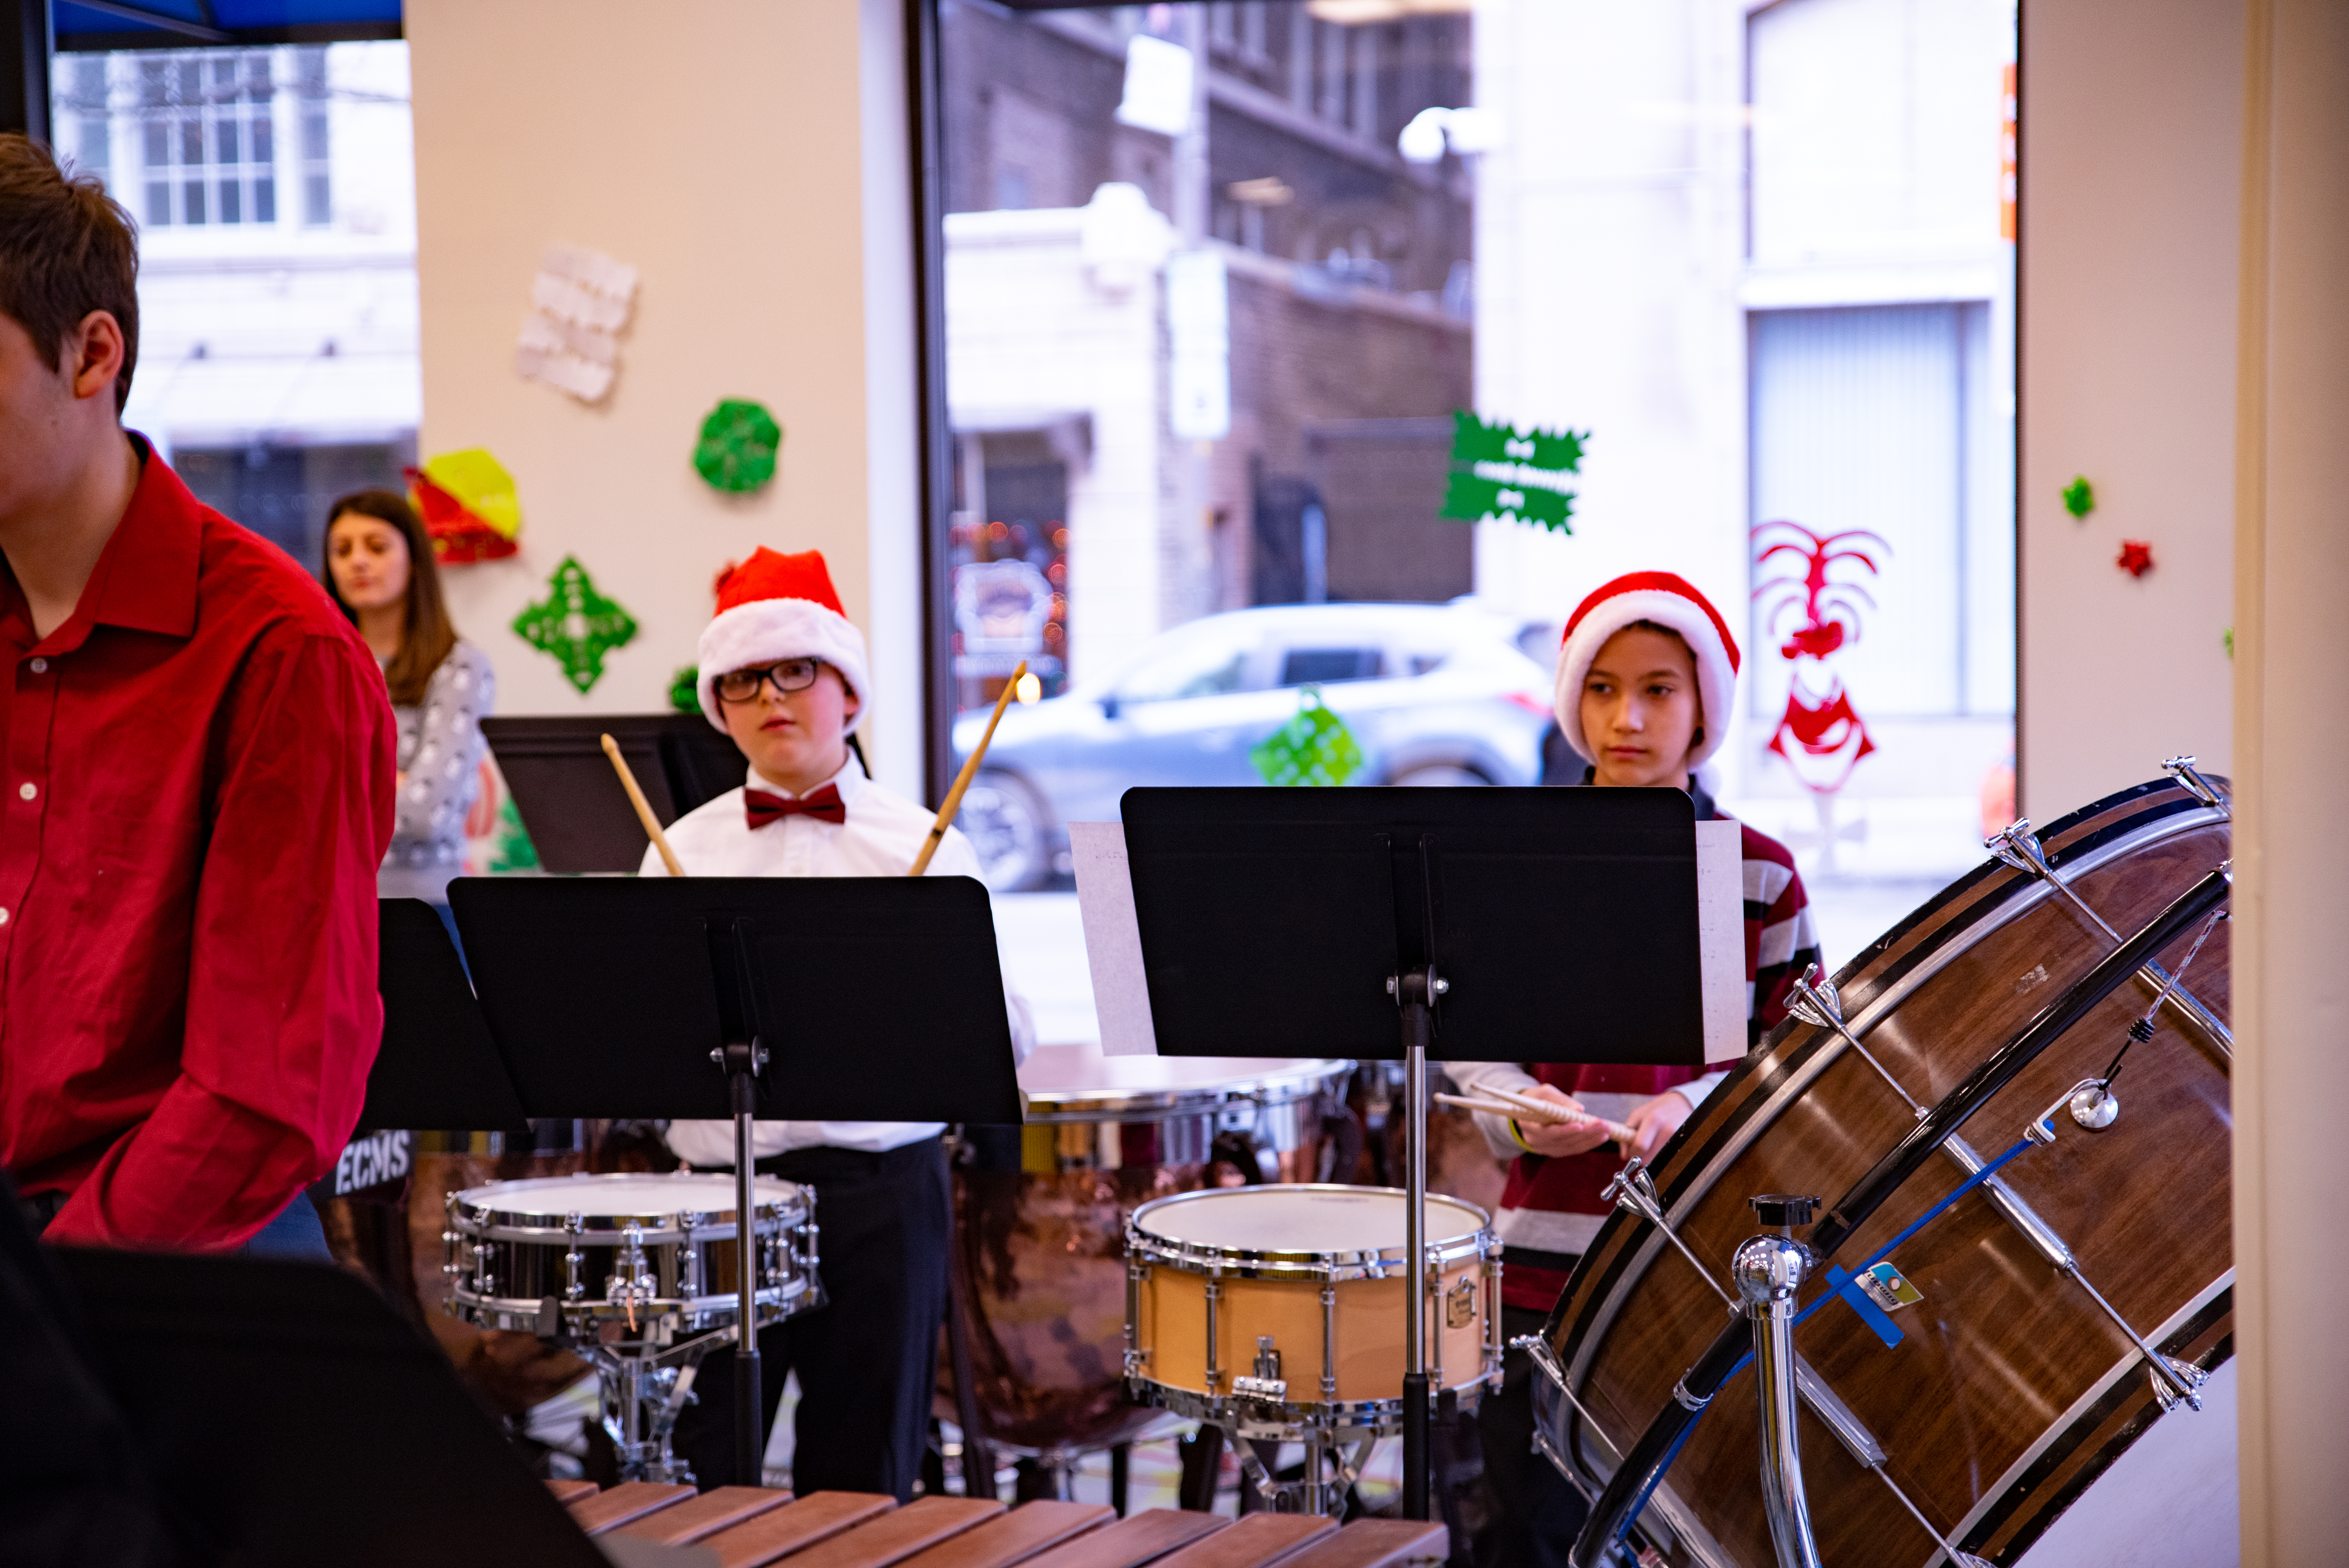 2018-12-15_ECMS_Winterfest_PercussionEns_MM_2681